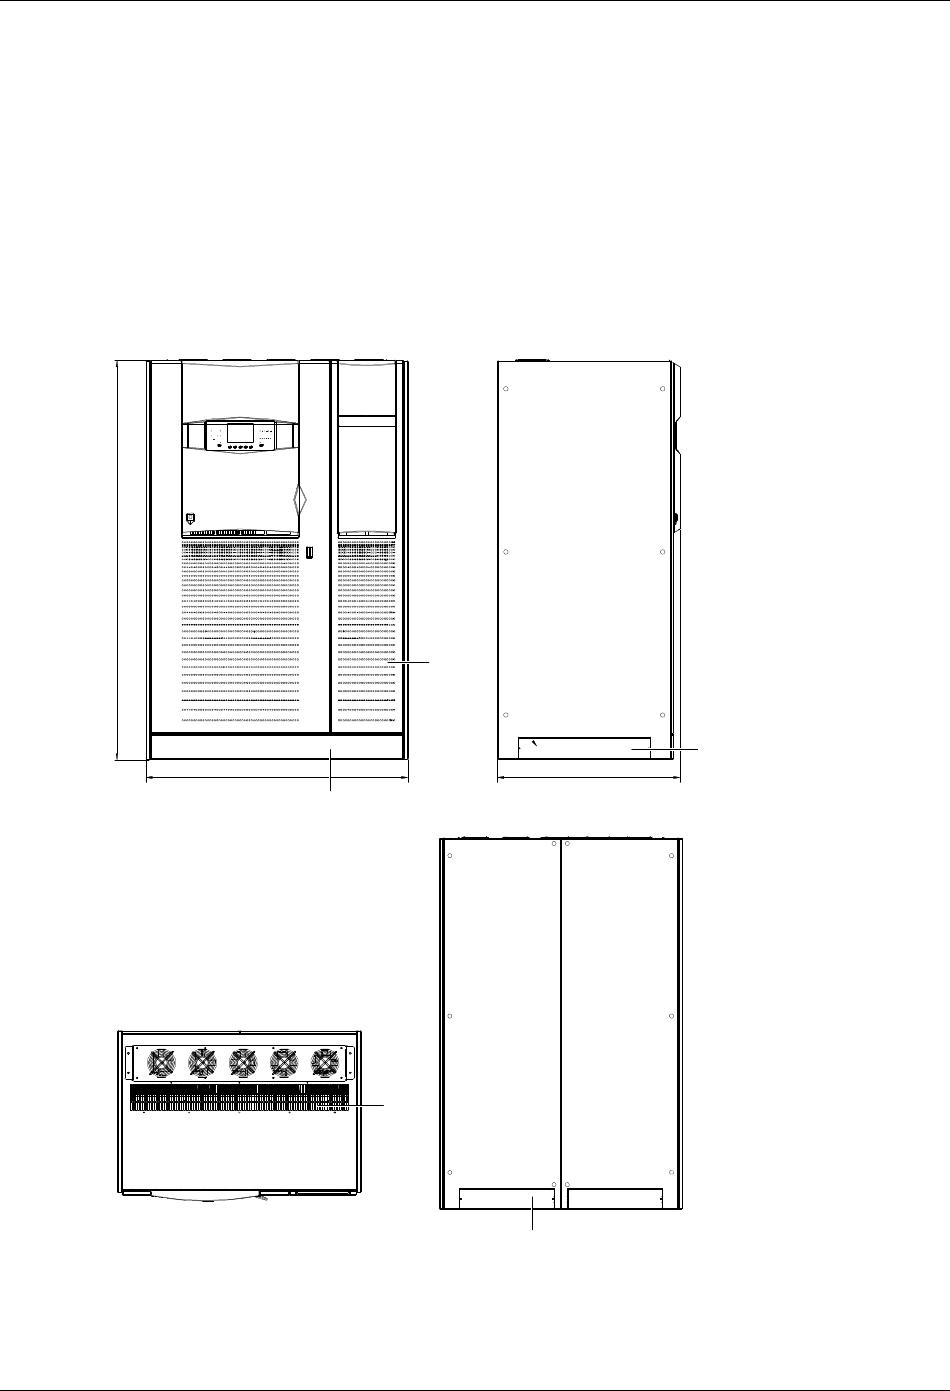 Emerson 160 200 300 400Kva Users Manual HiPulse U User's